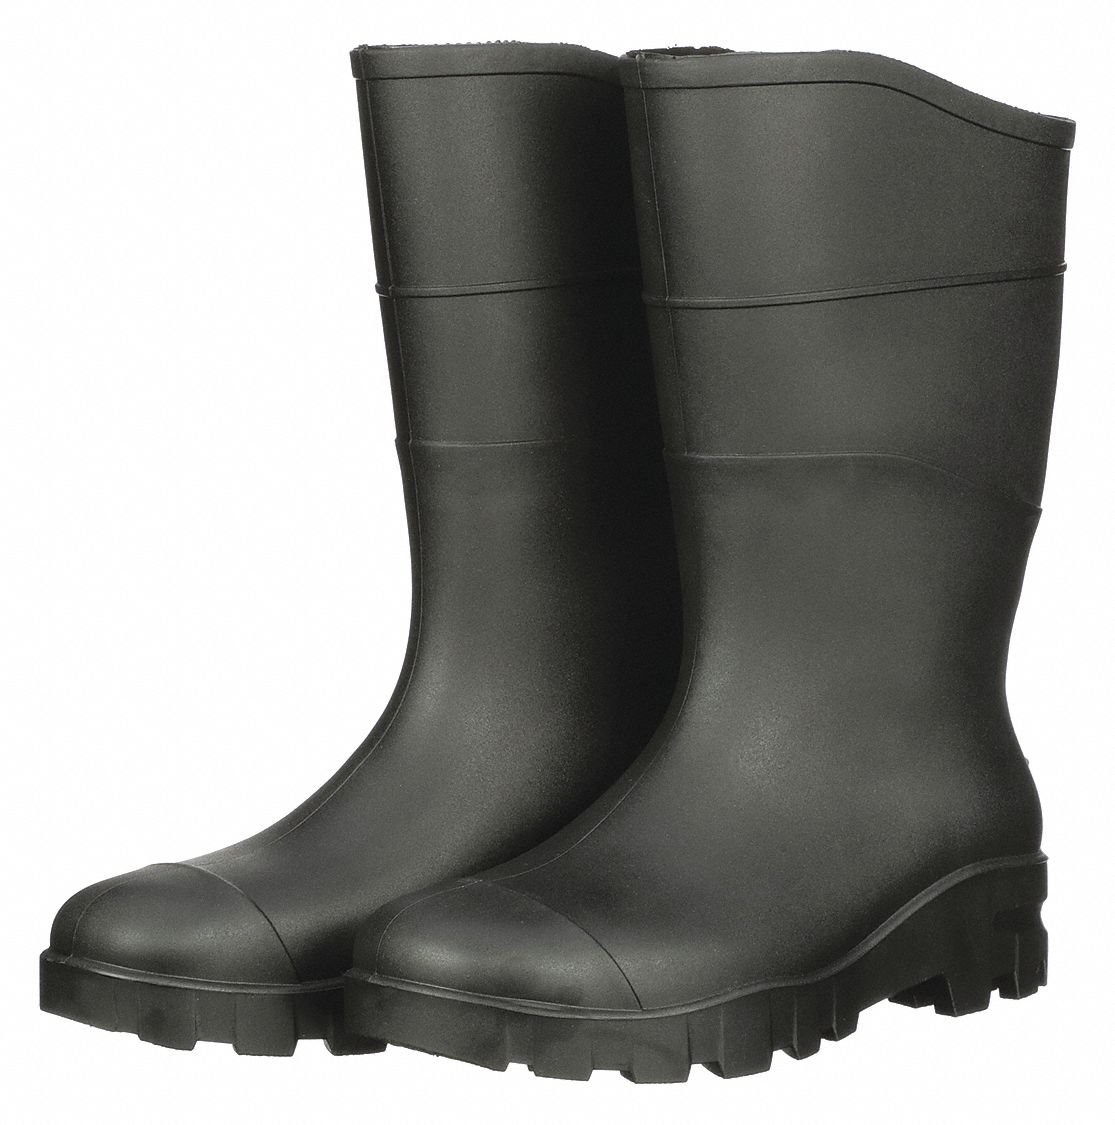 talon trax 13 h men 39 s boots steel toe type pvc upper material black size 5 21a576 21a576. Black Bedroom Furniture Sets. Home Design Ideas